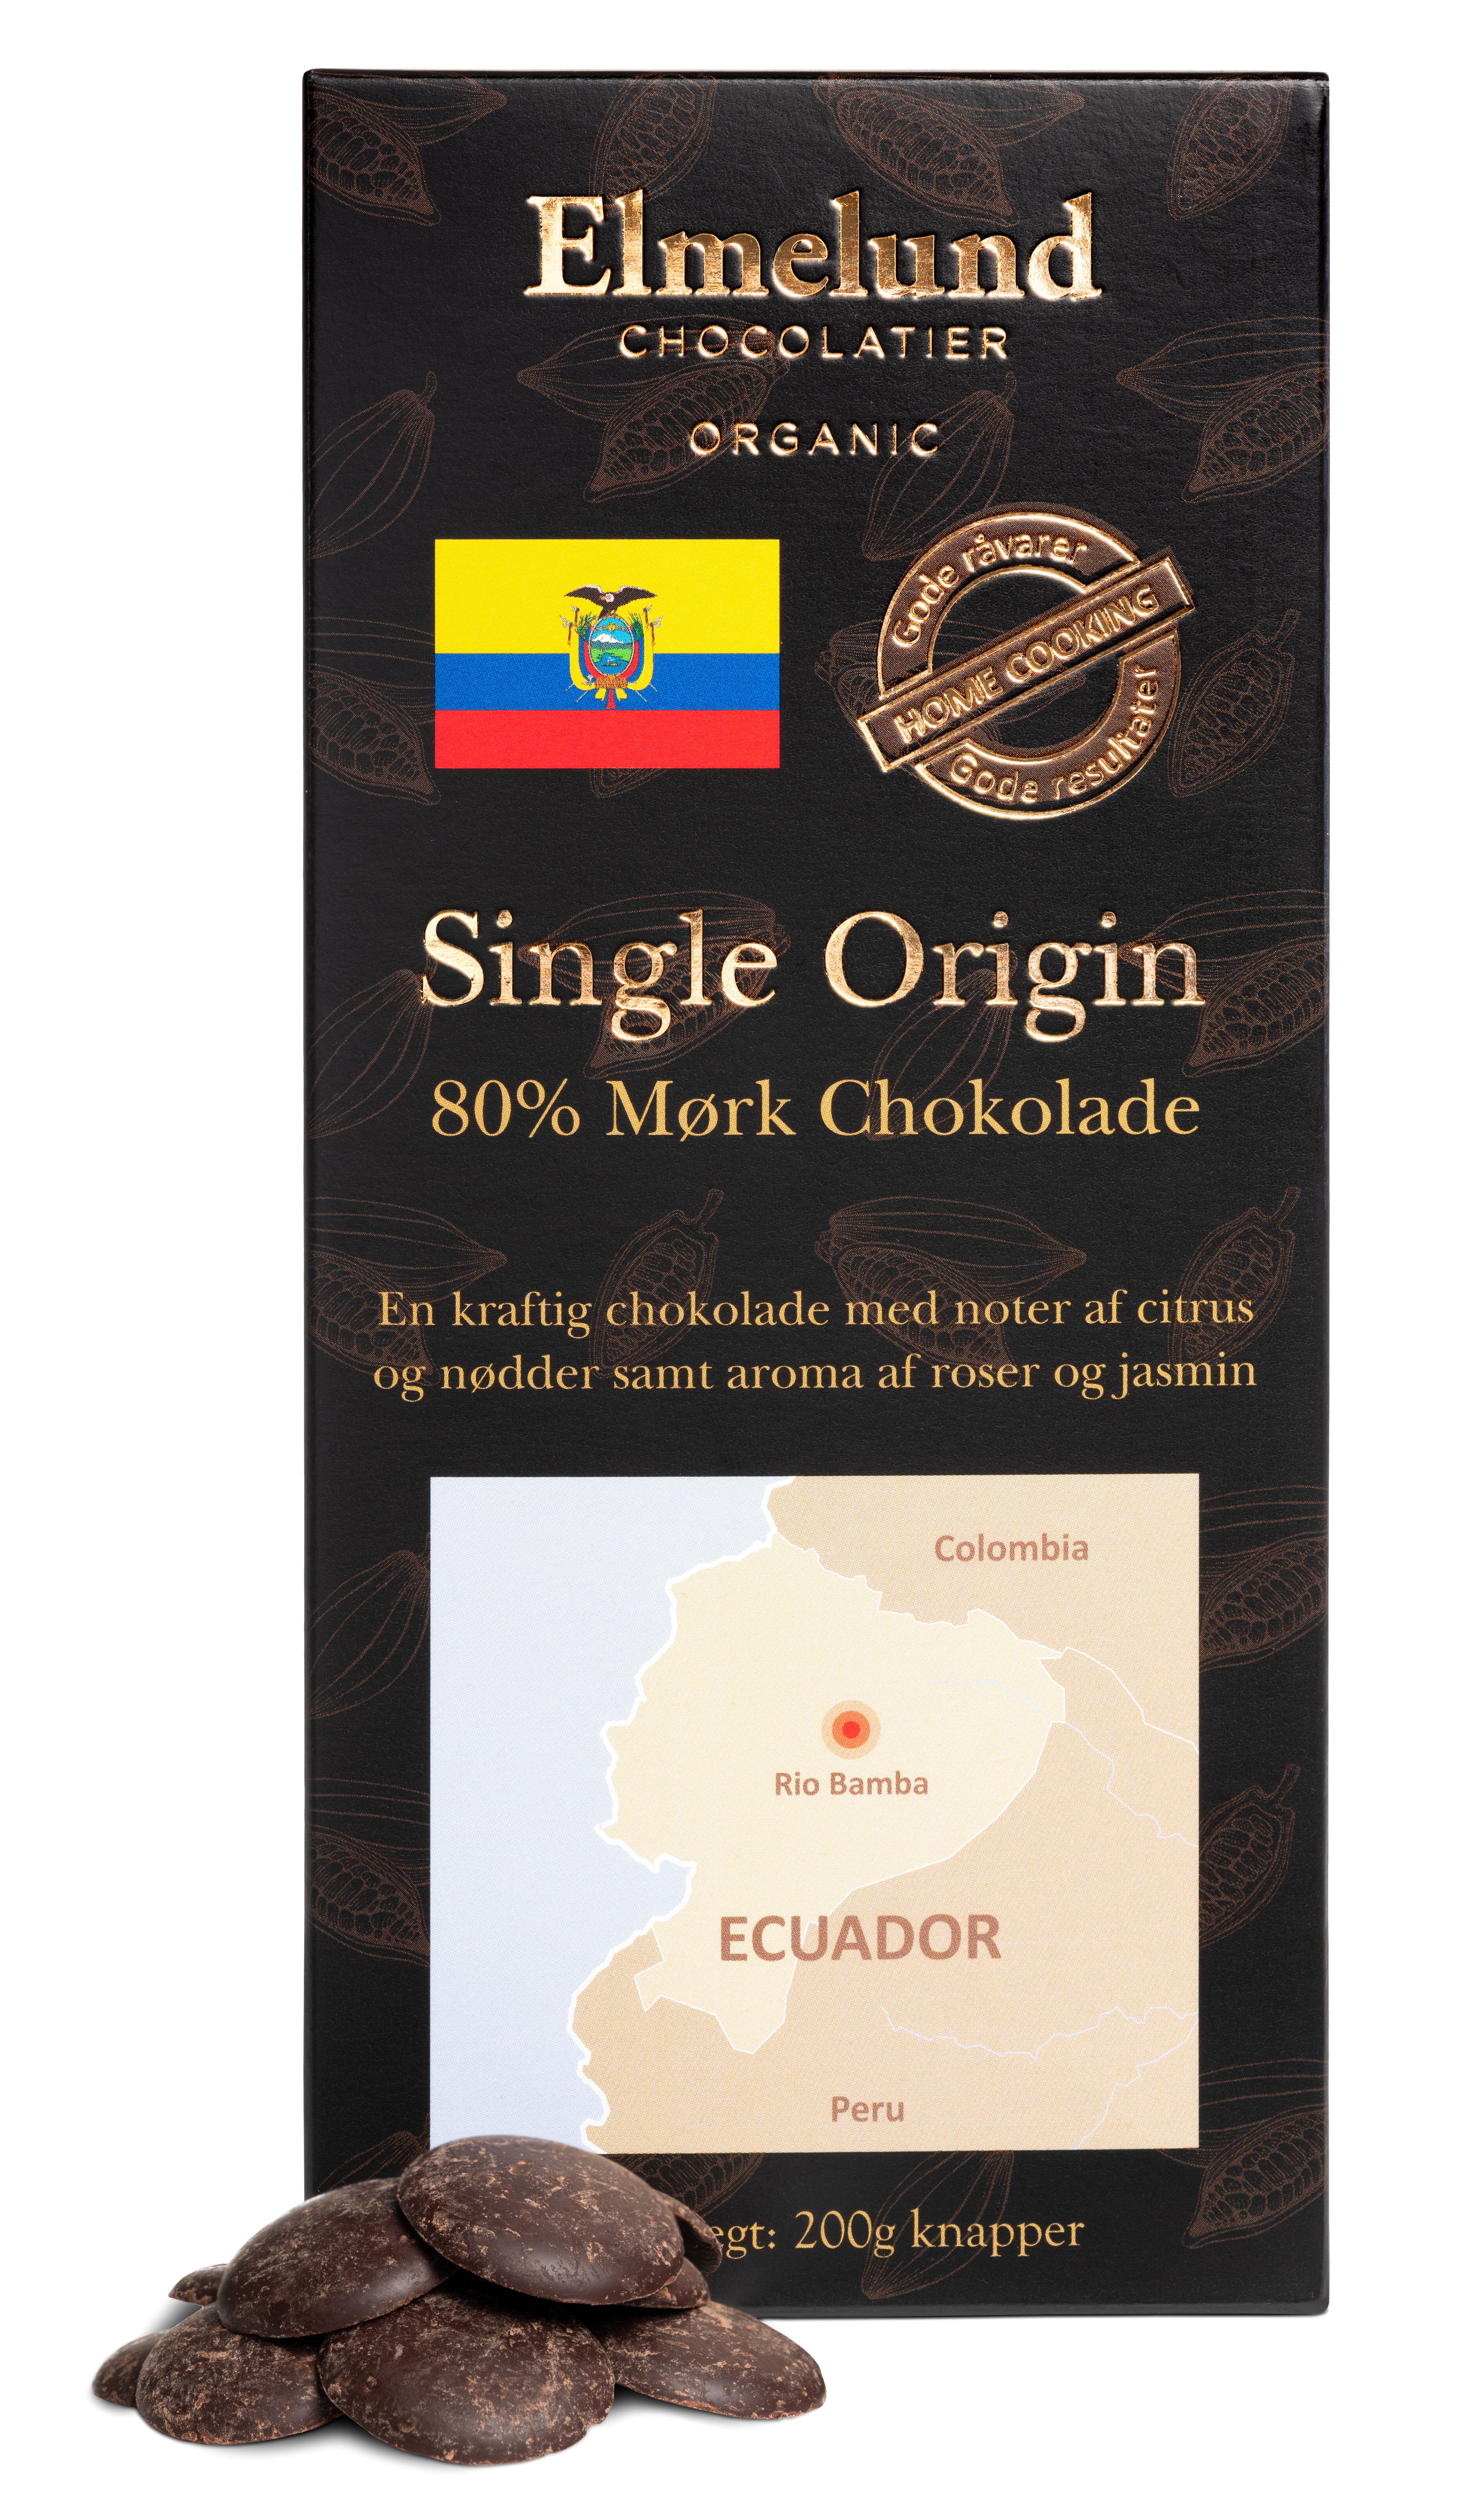 Billede af 200g - Ecuador 80% Mørk Chokolade